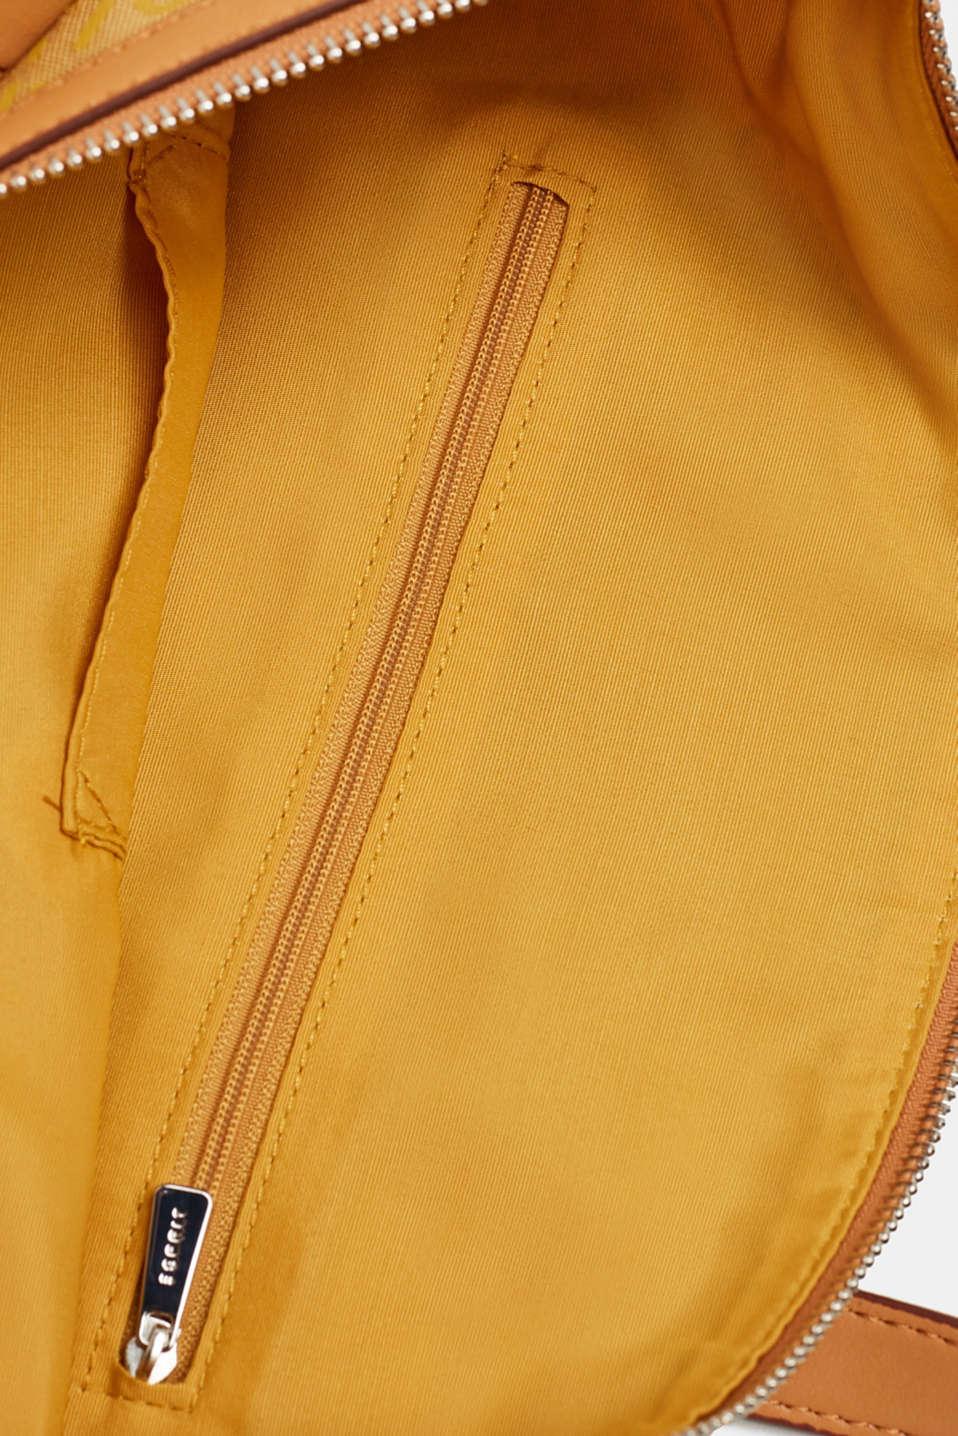 Monogram shoulder bag made of nylon, YELLOW, detail image number 4